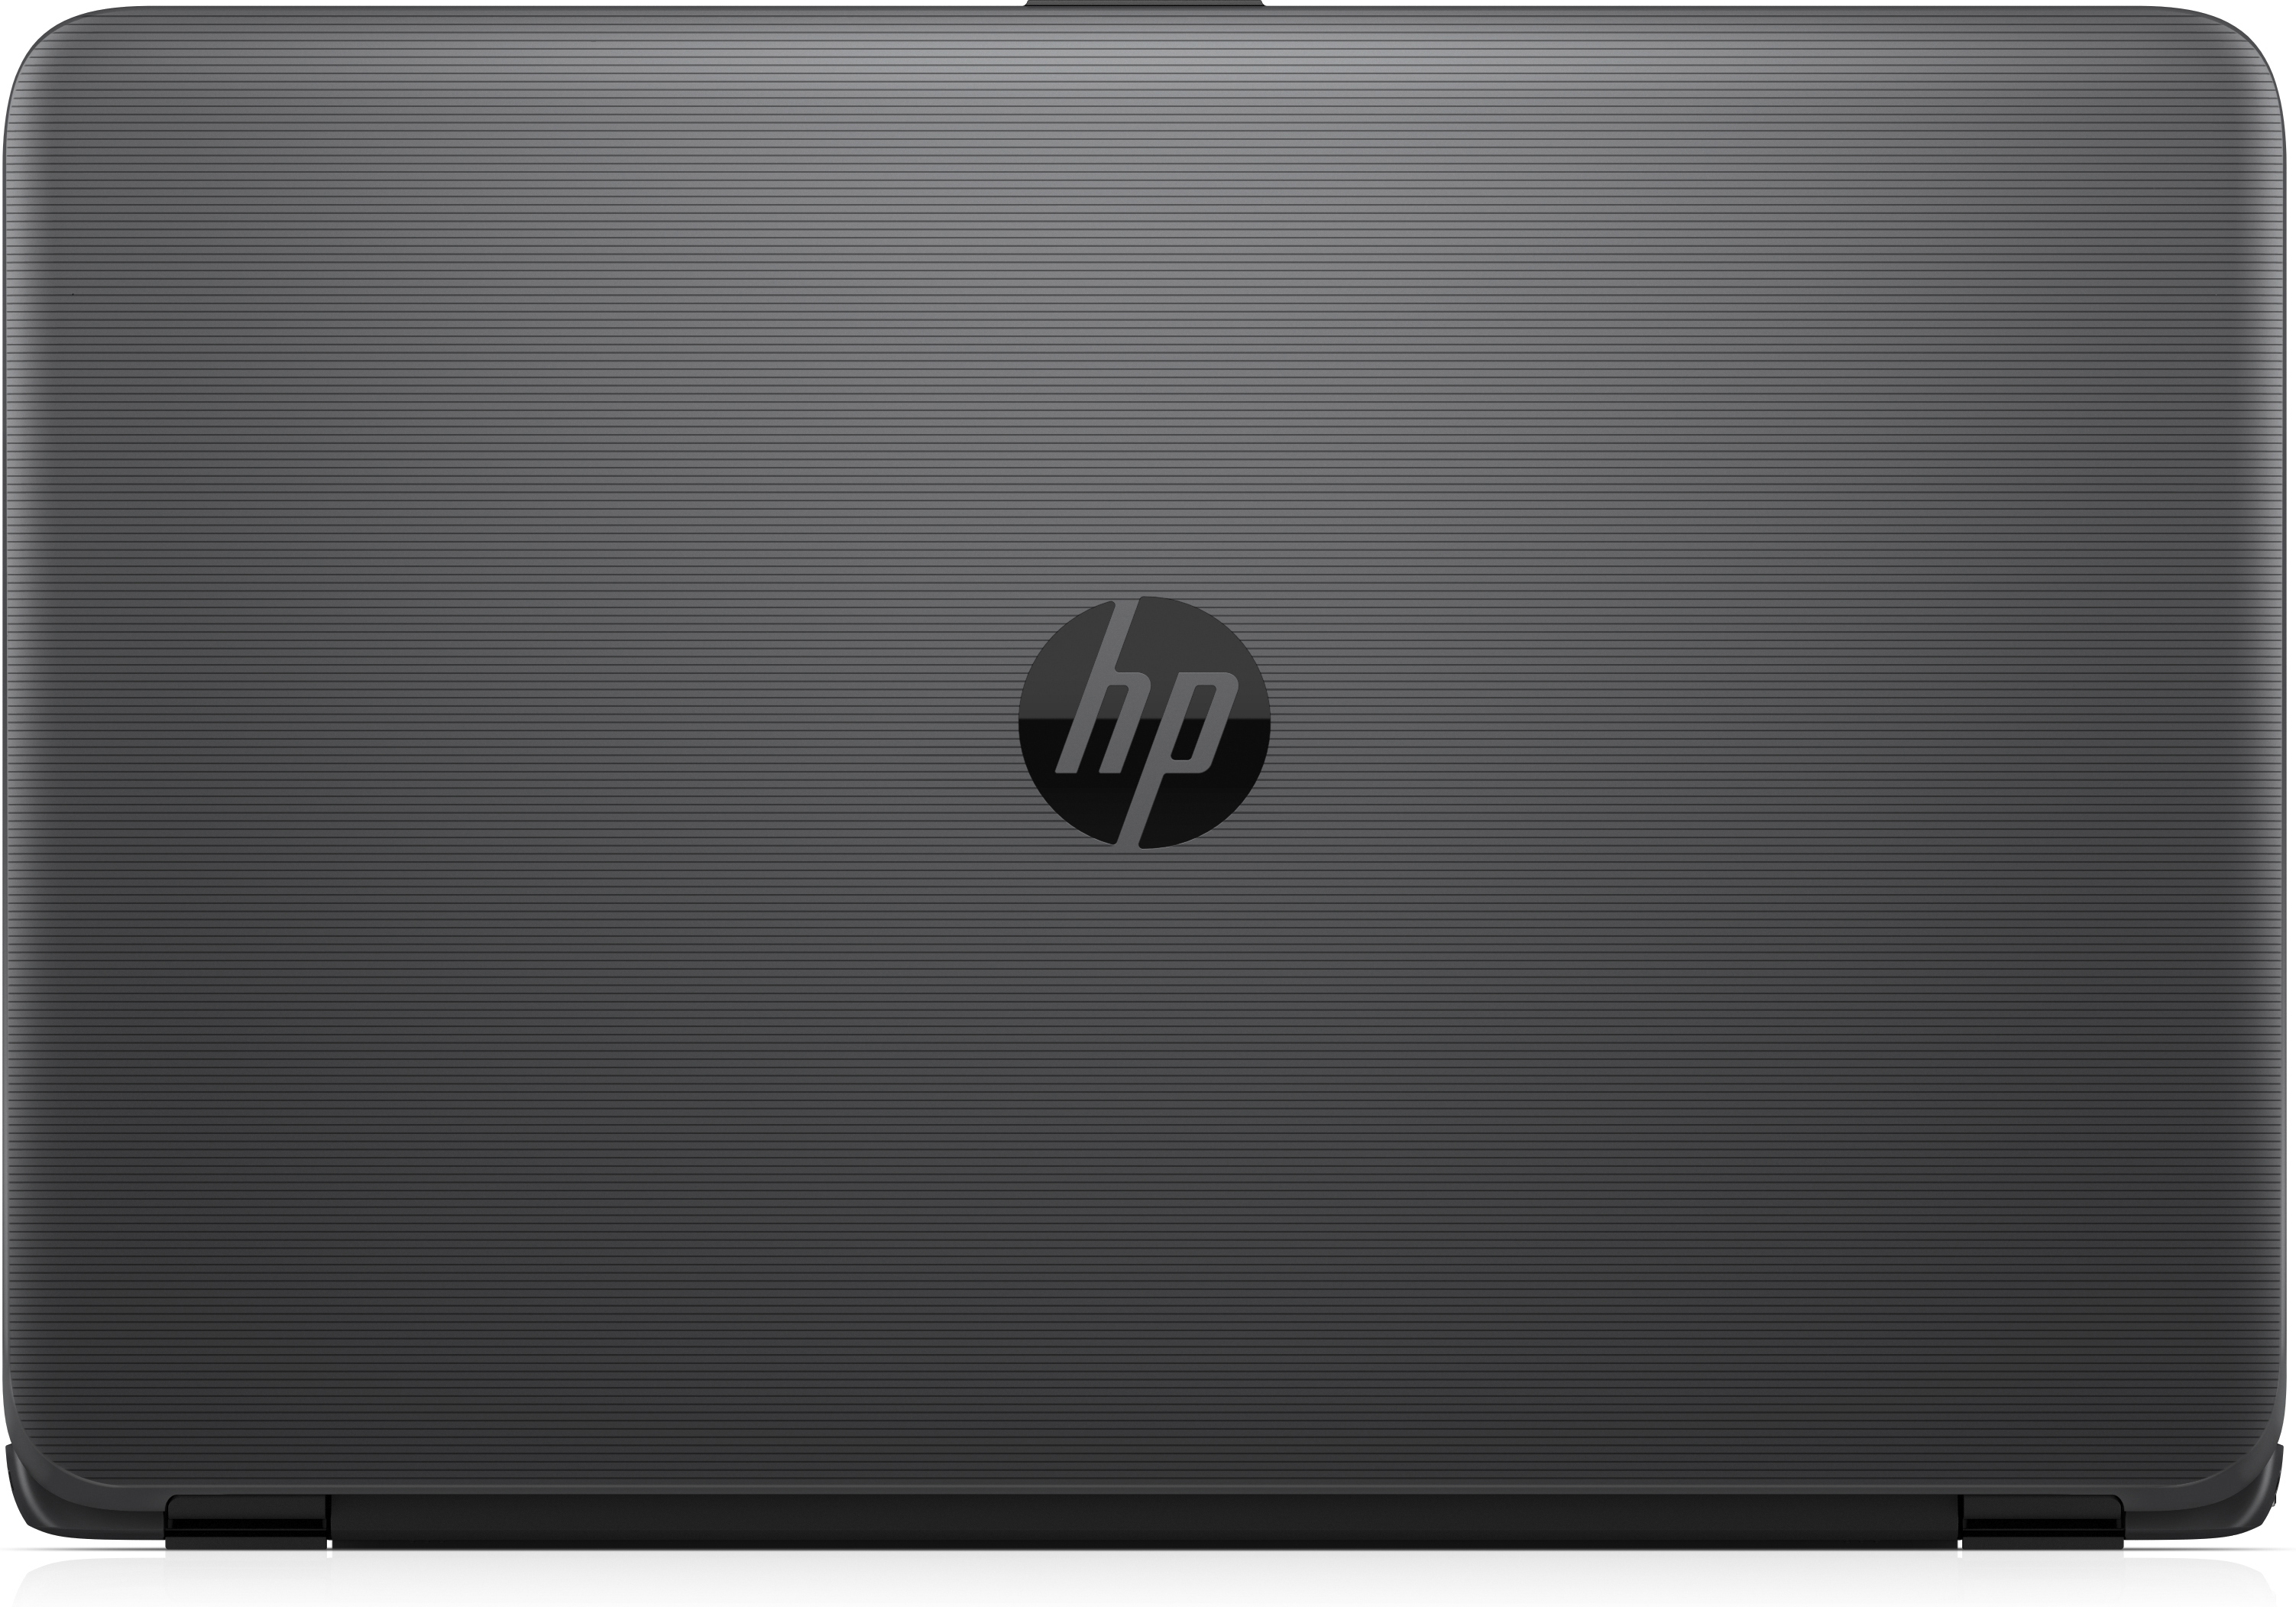 200 250 G5 2.70GHz i7-7500U 15.6Zoll 1920 x 1080Pixel Schwarz Notebook